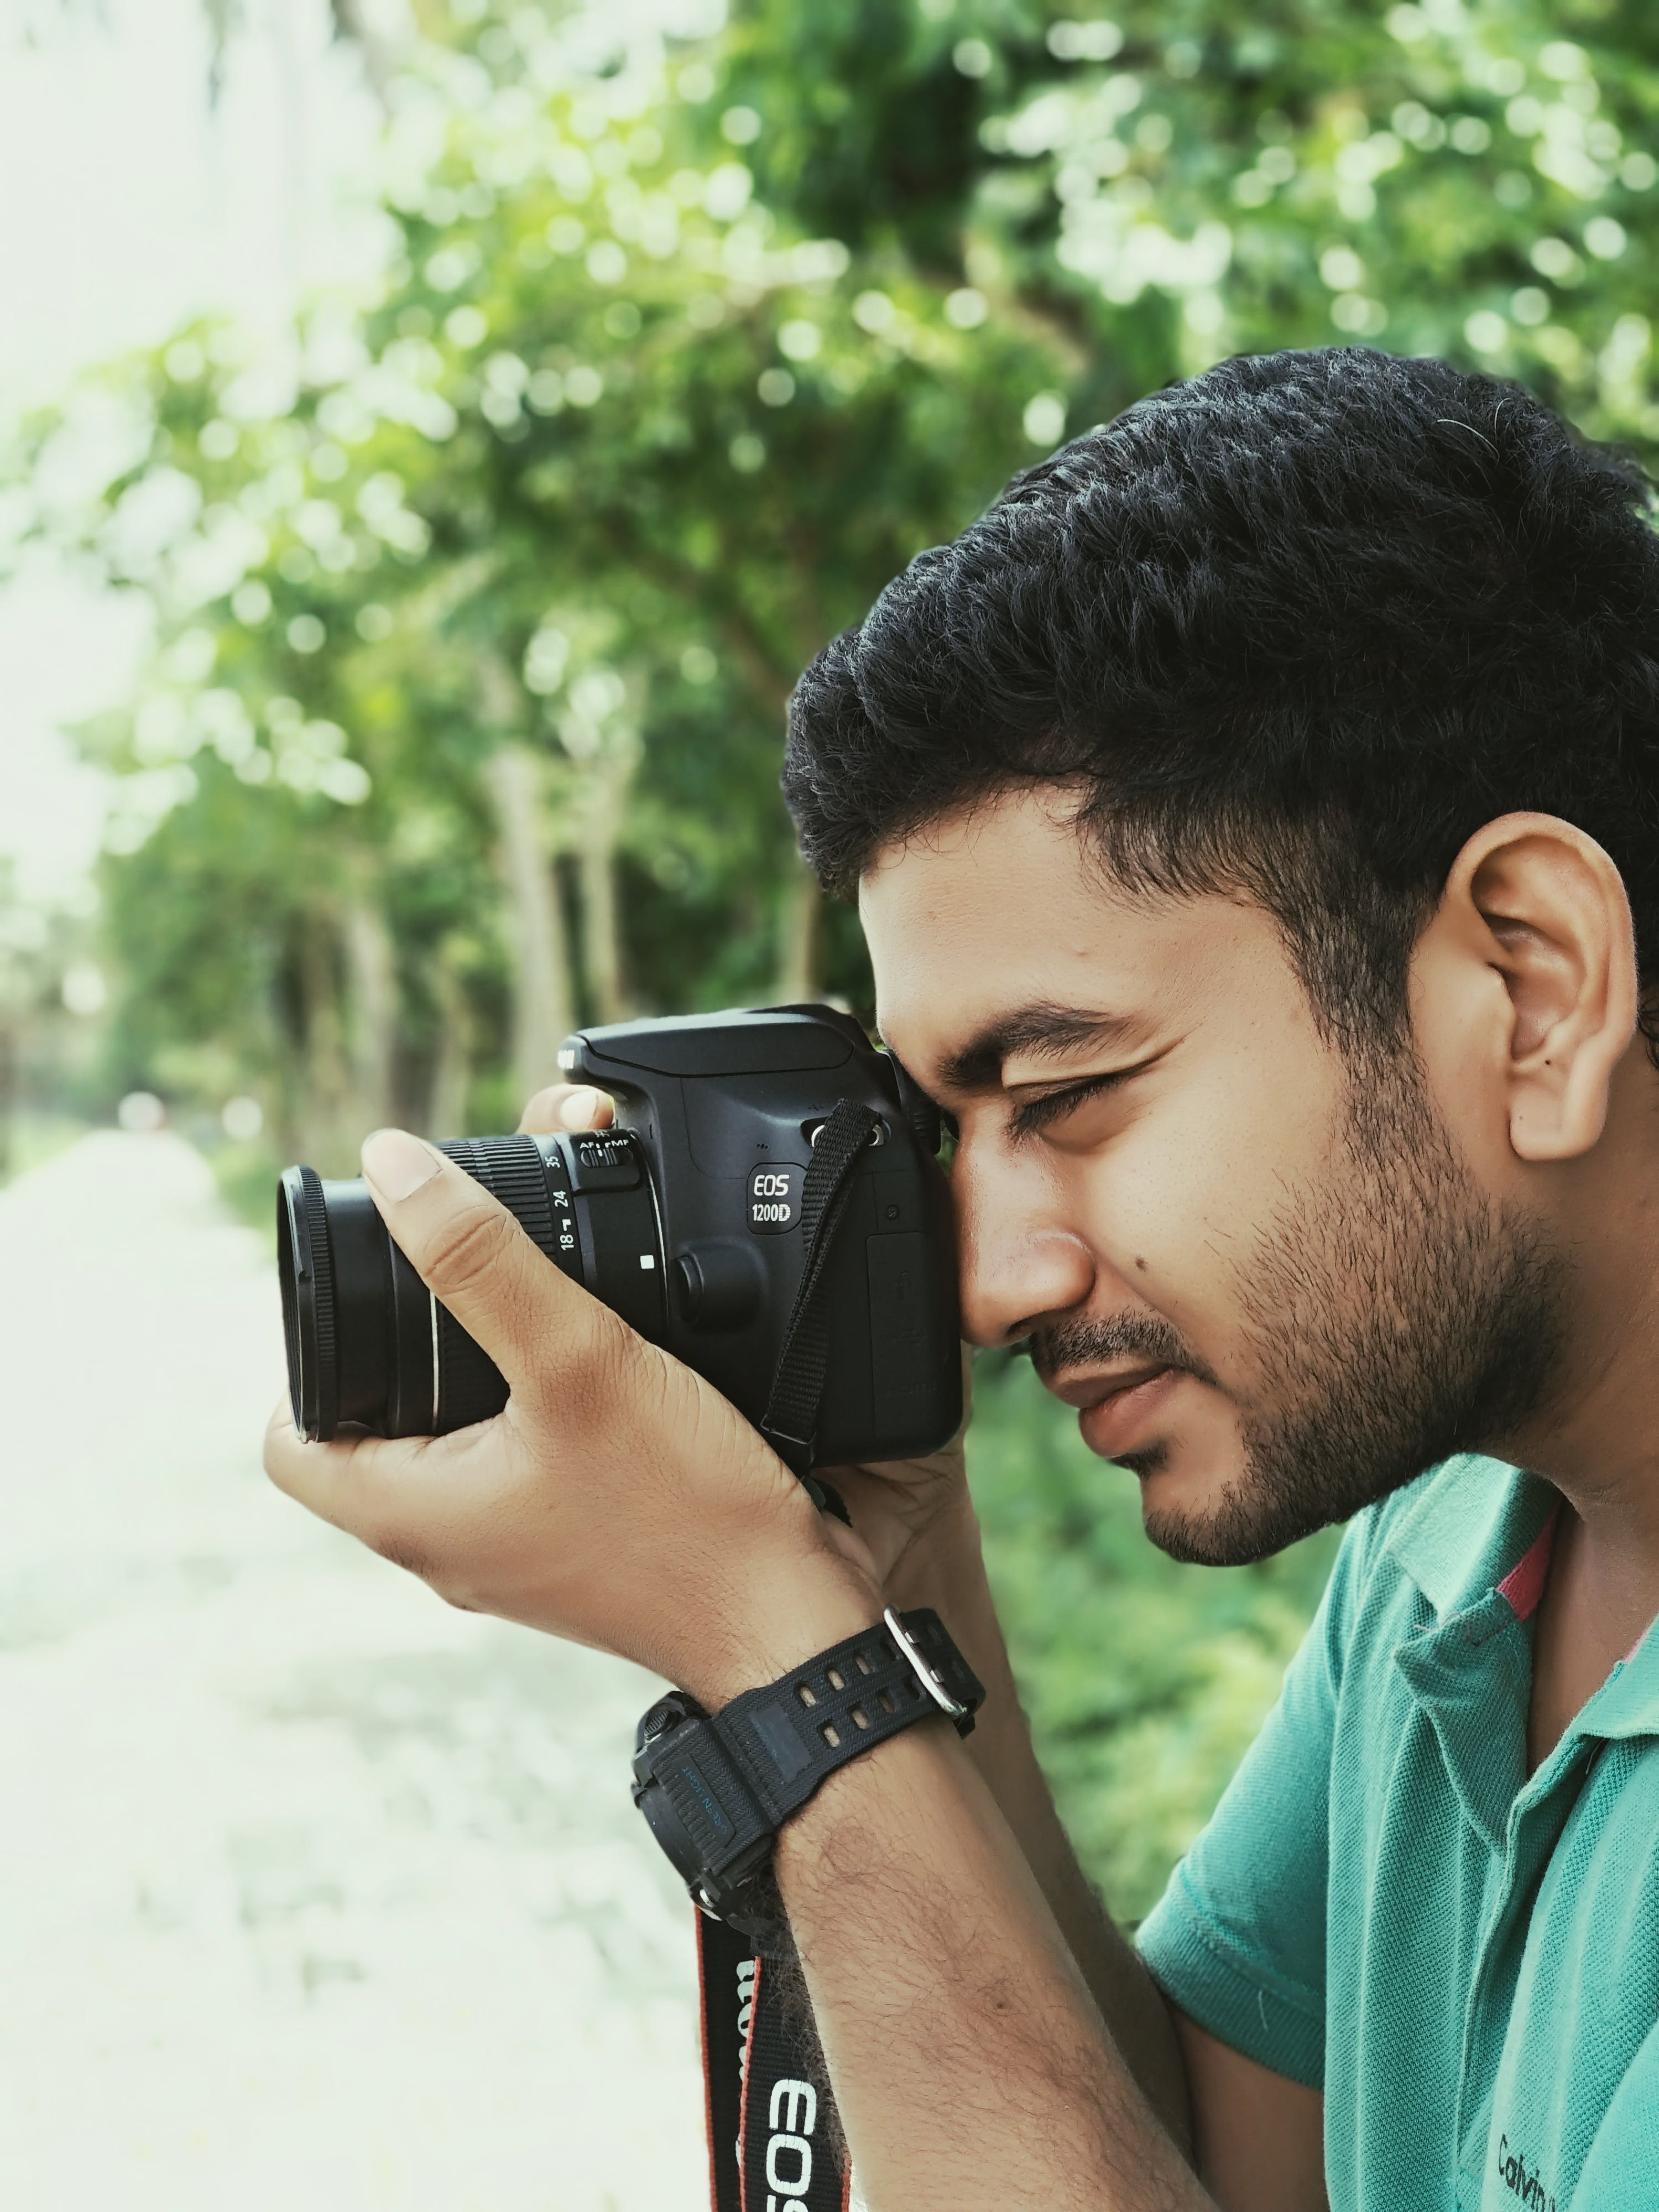 Man Using Canon Eos Camera